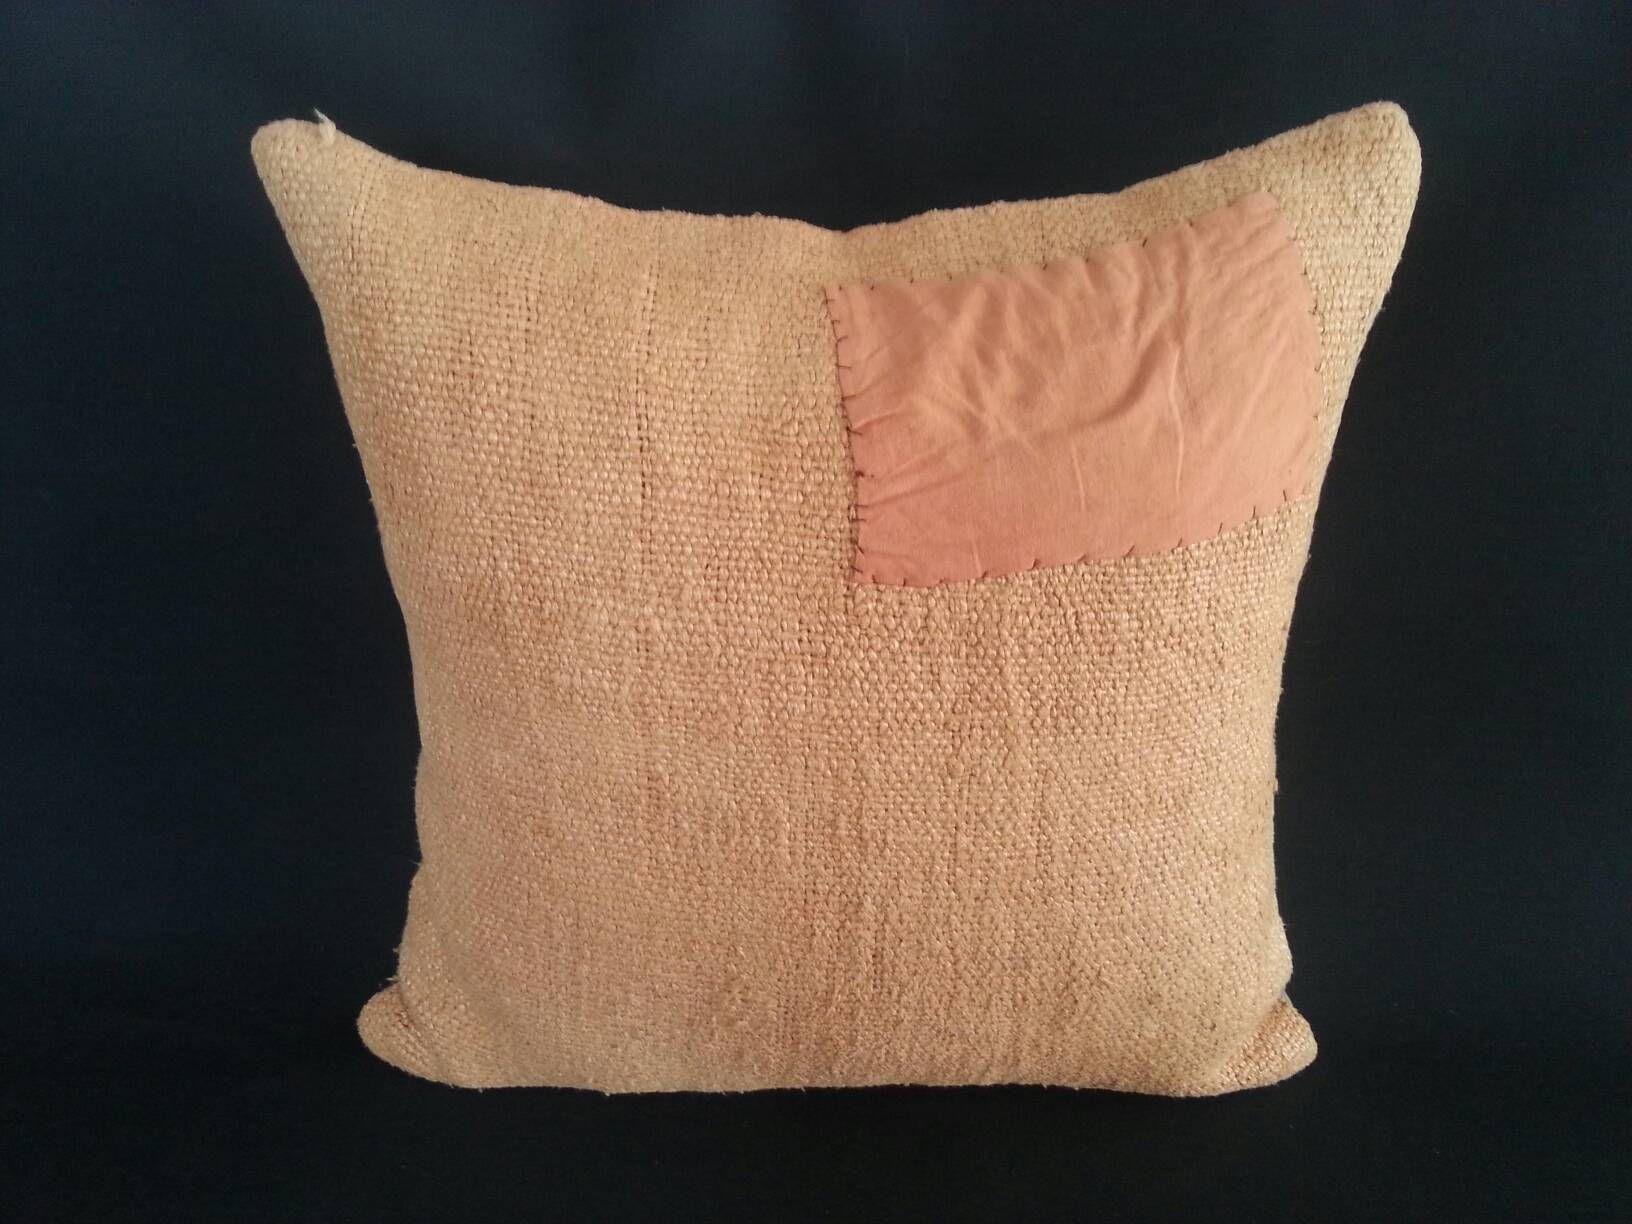 Hemp Mustard Pillow Living Room Decoration Pillow 18x18inches Handwoven Antique Decorative Turkish Hemp Cushion Cover Pillows Sofa Pillow Goruntuler Ile